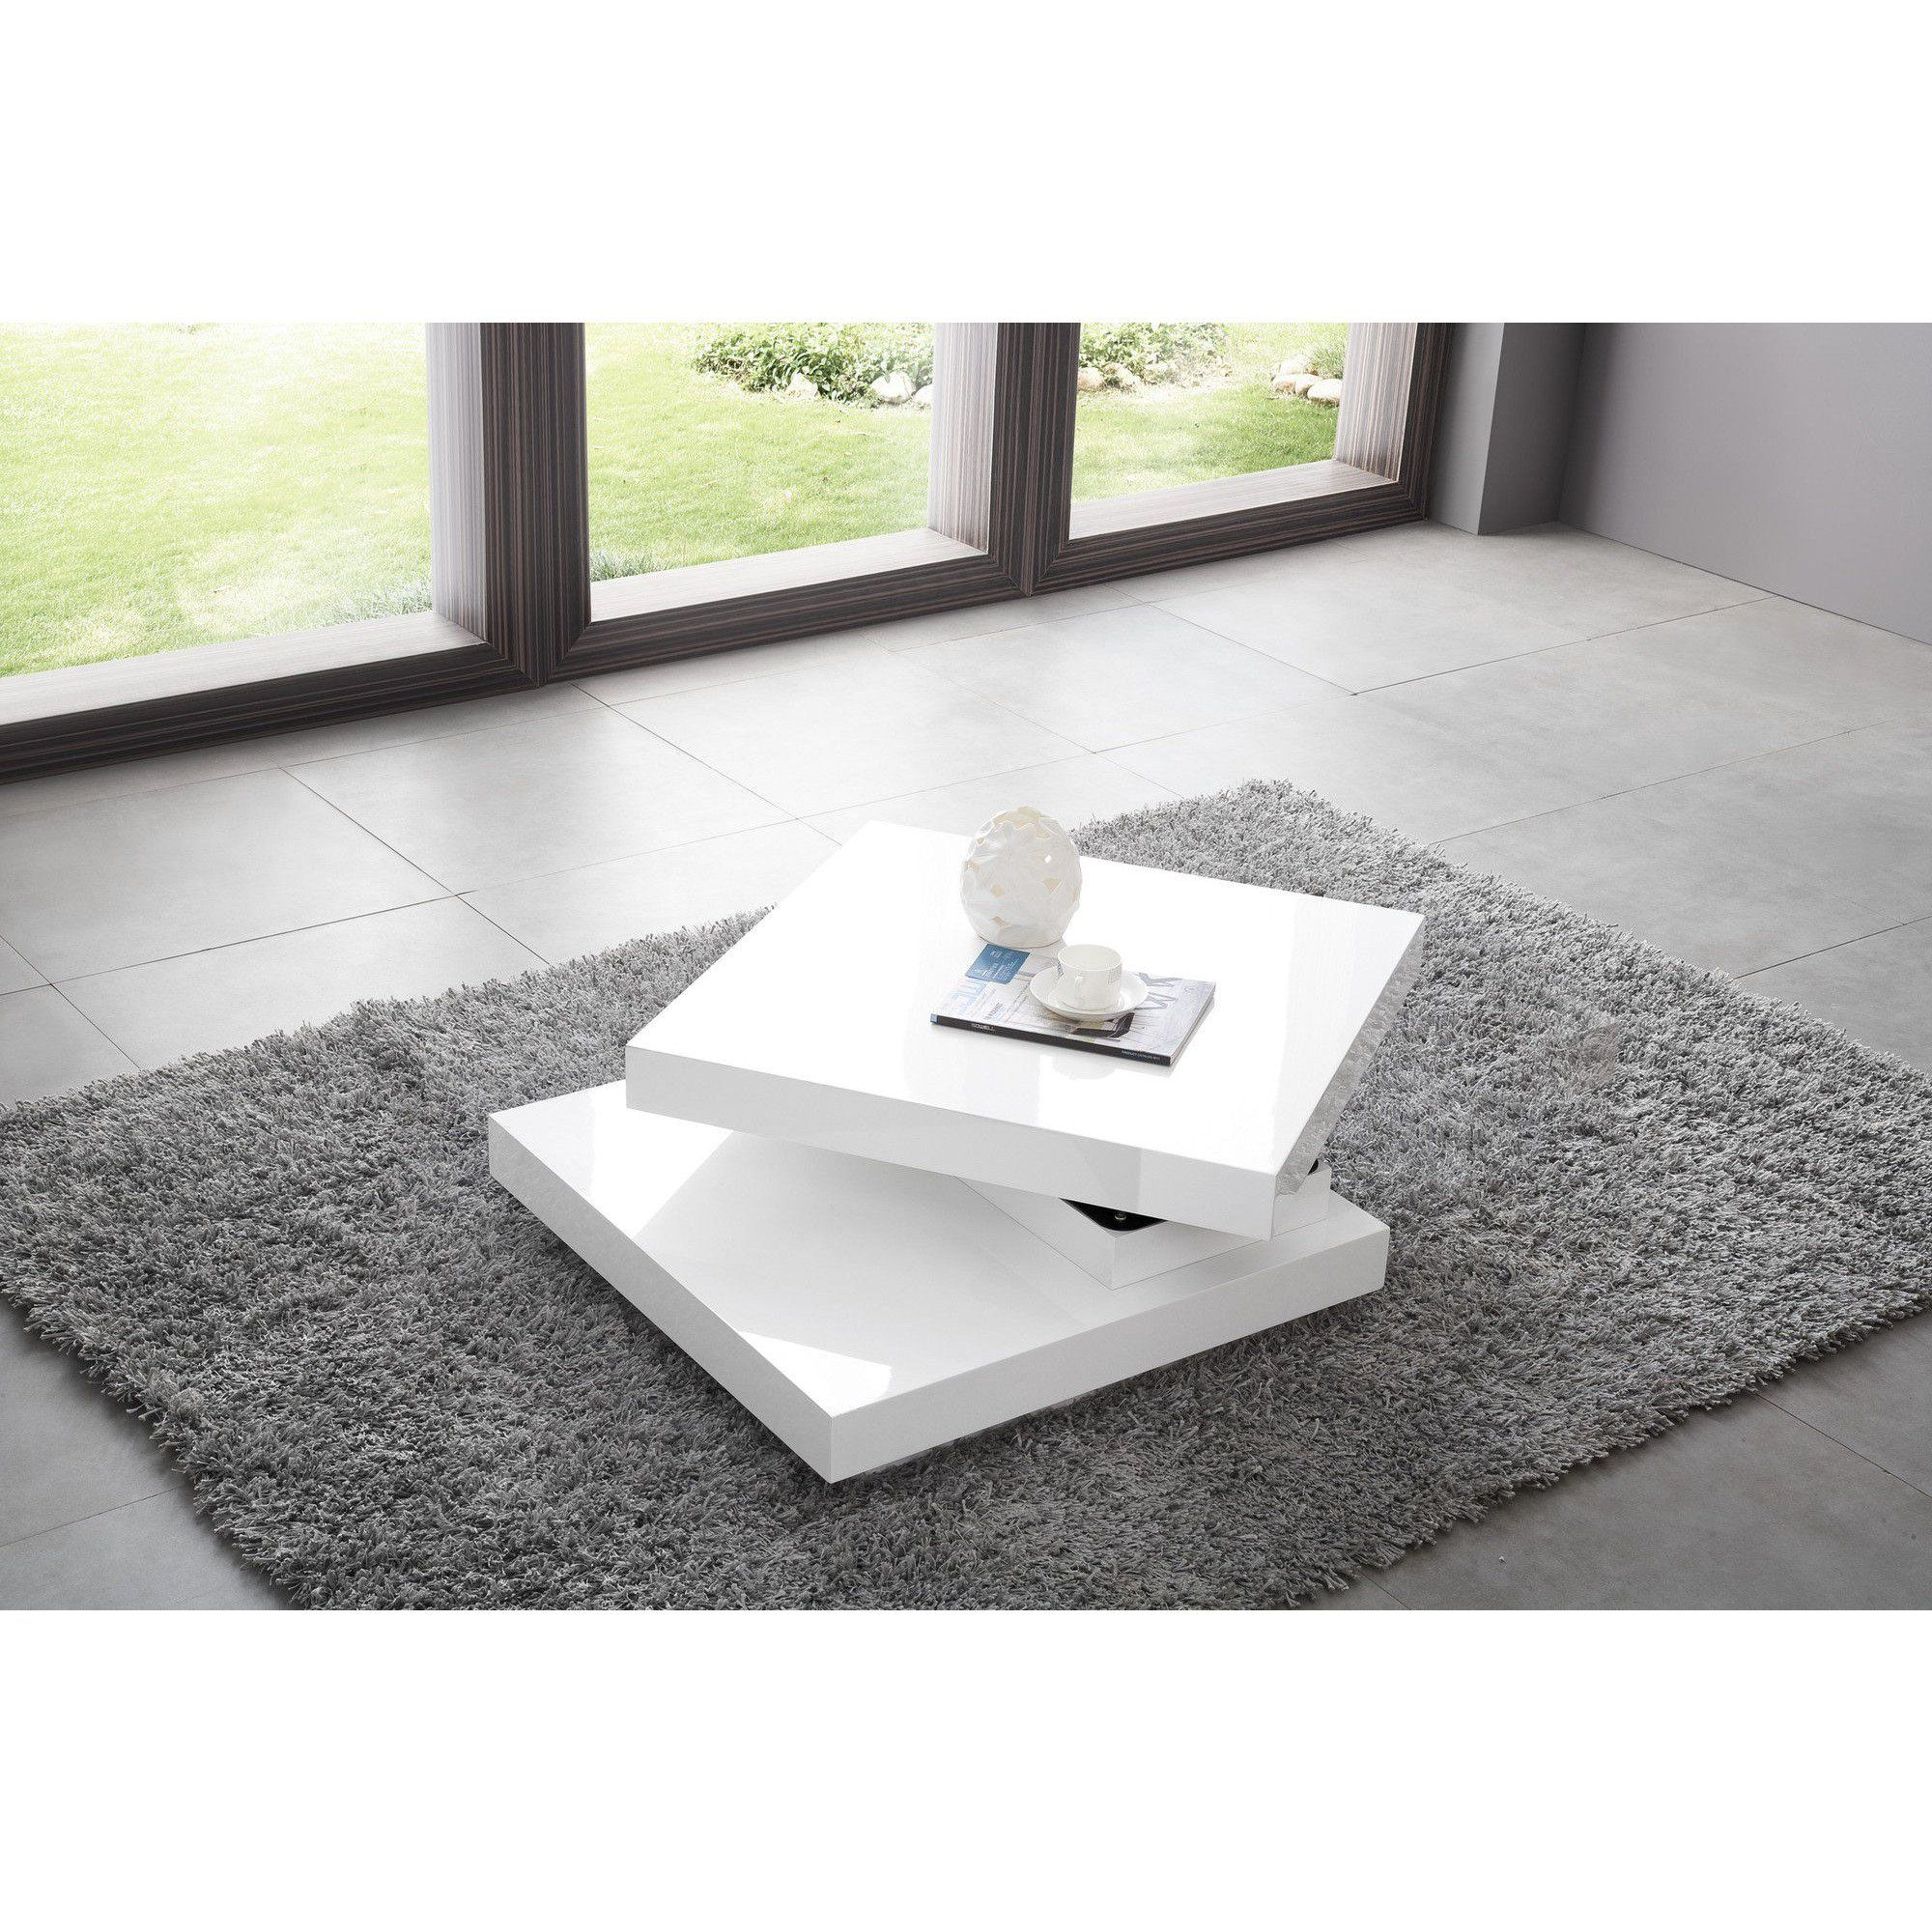 Table Basse Carree A Plateau Pivotant Design Blanc Laque Table Basse Design Table Basse Blanc Laque Table Basse Carree